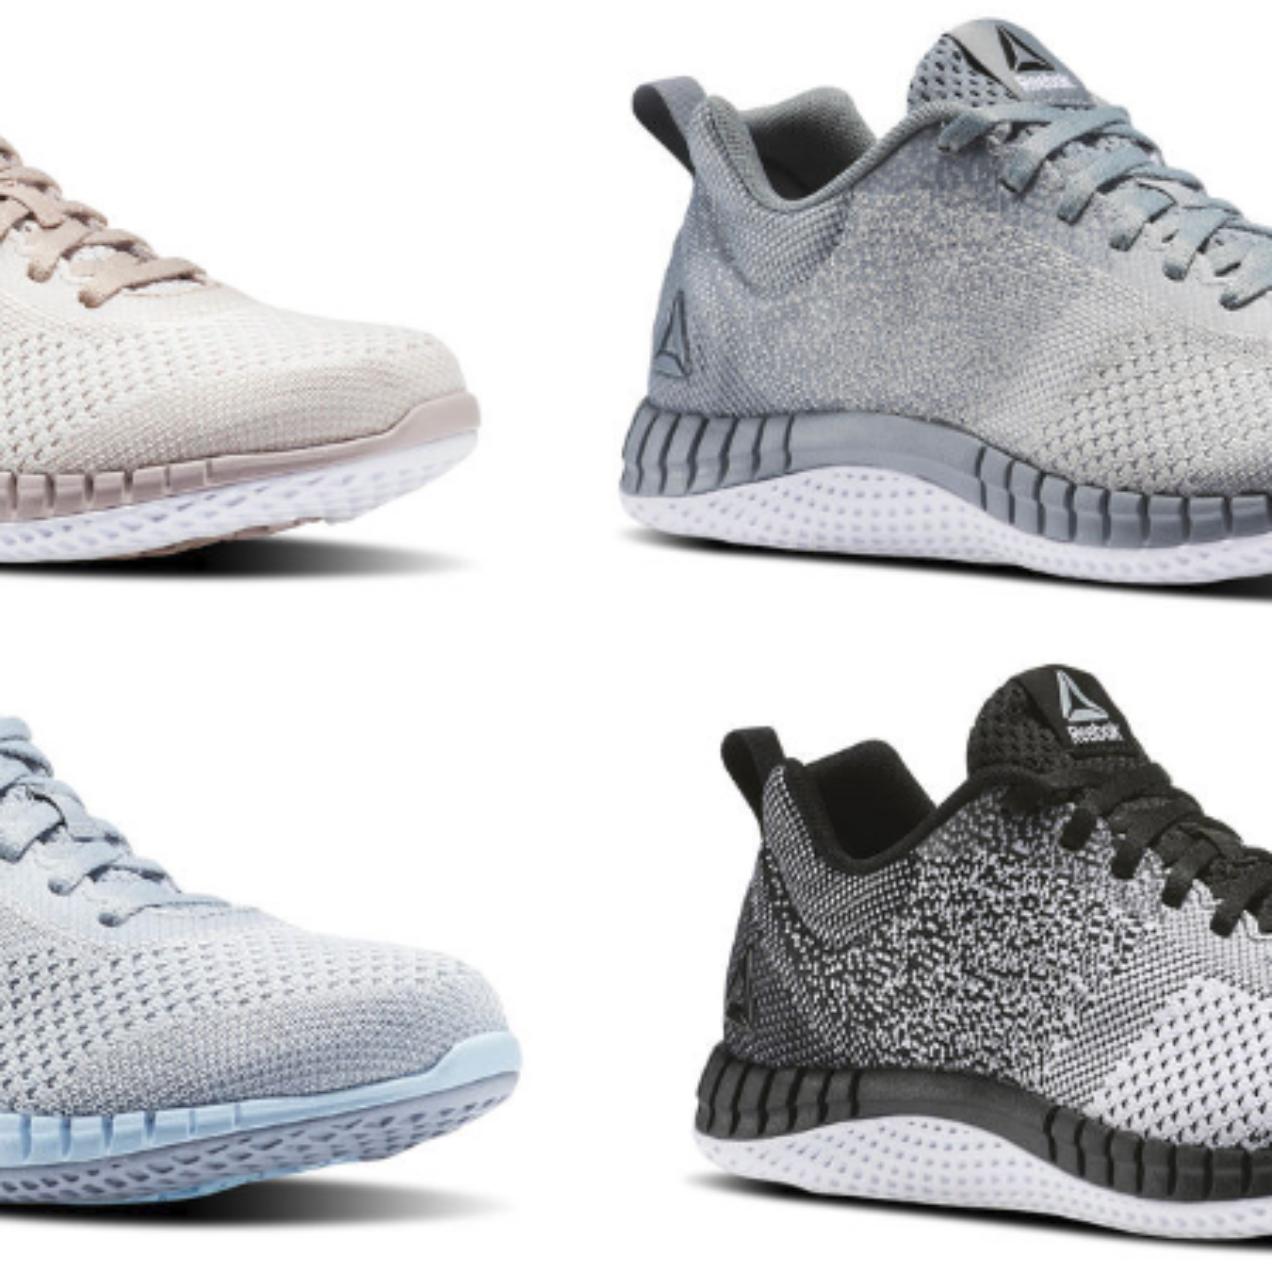 Reebok Ultraknit Running Shoes for Men and Women Only $35 (Regular $80)